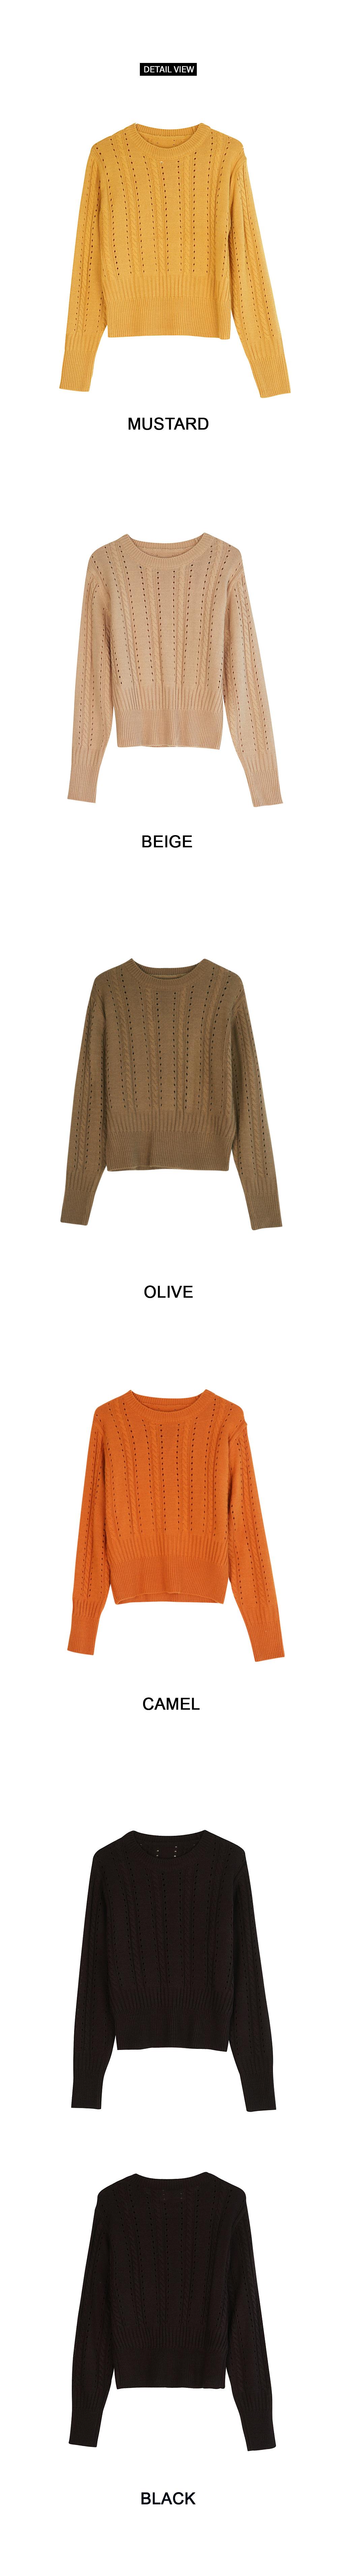 Romi slim knit autumn